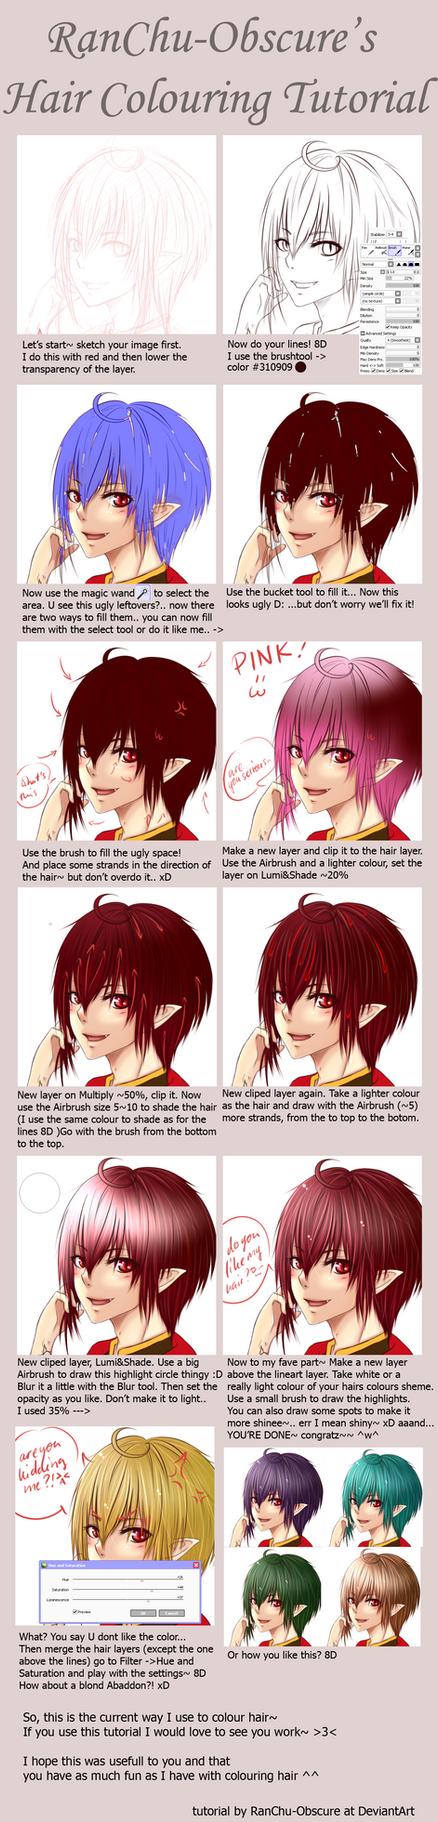 SAI Hair Colouring Tutorial by RanChu-Obscure